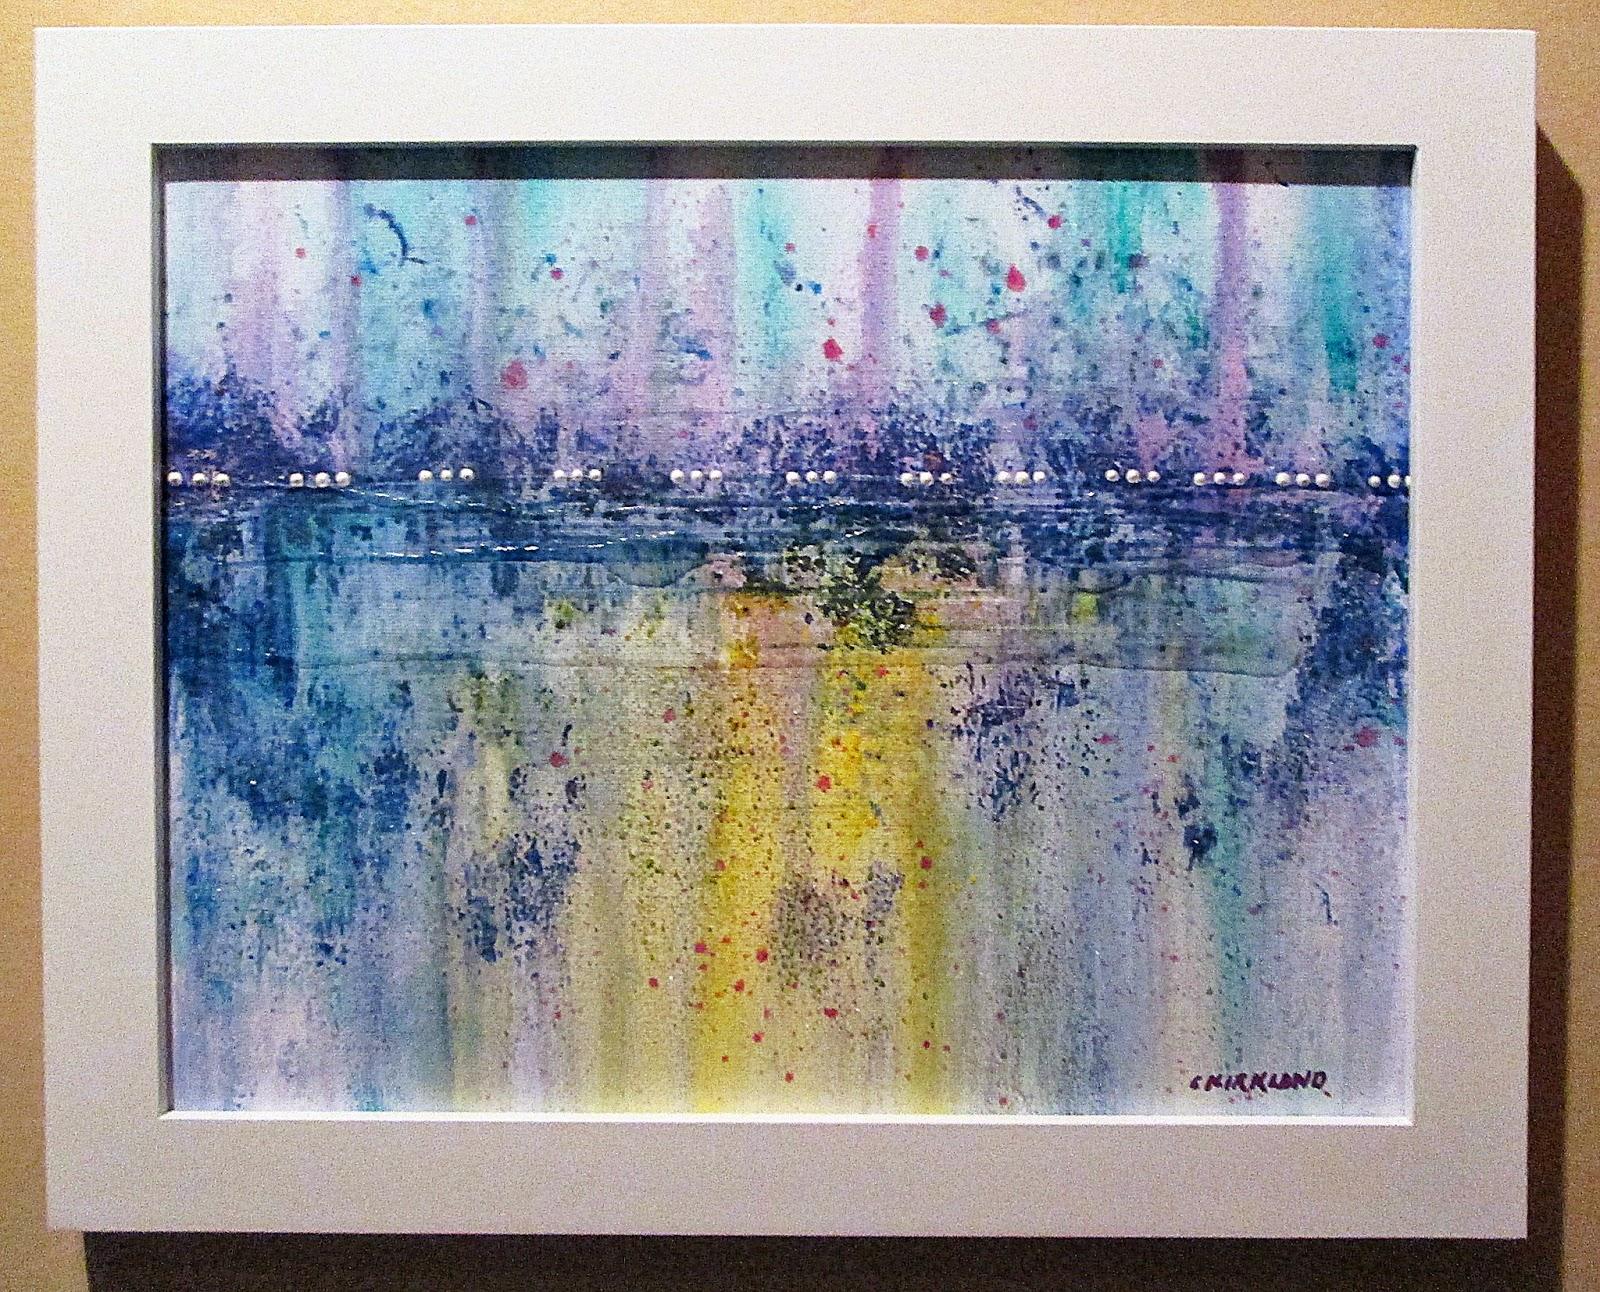 Fine Framing A Canvas Board Motif - Ideas de Marcos - lamegapromo.info